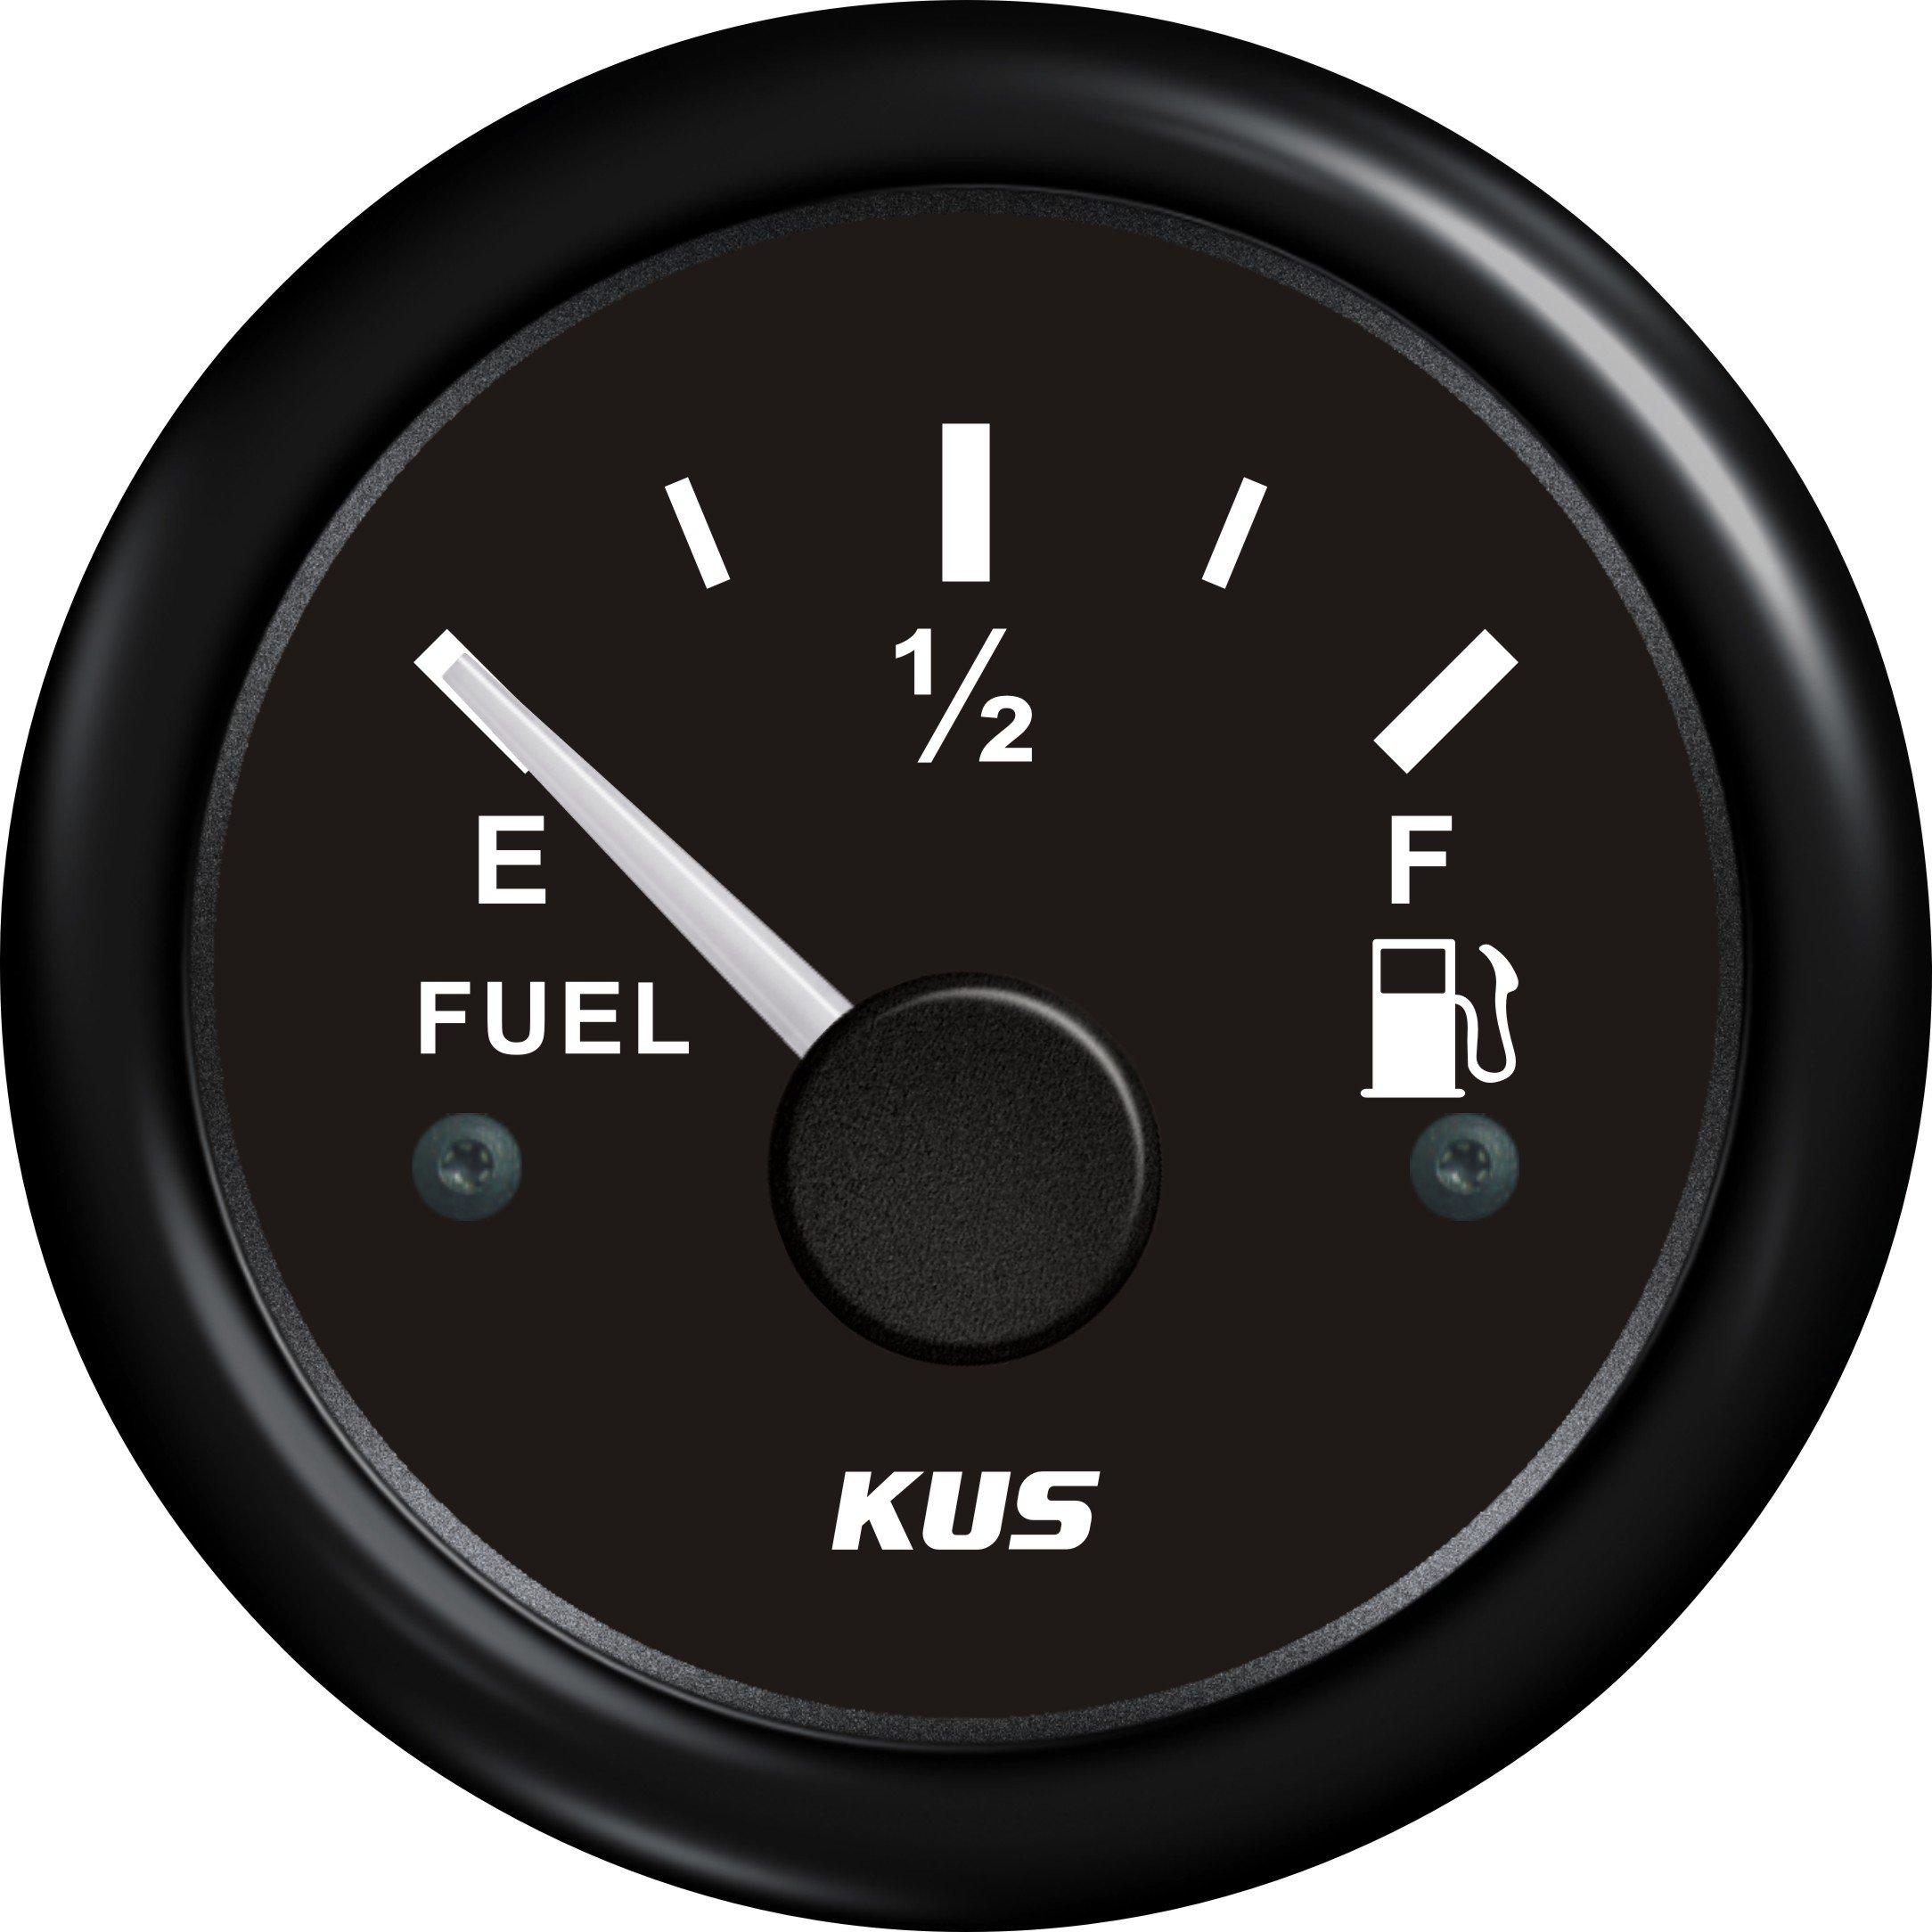 CPFR-BB-240-33 Fuel Level gauge by KUS USA